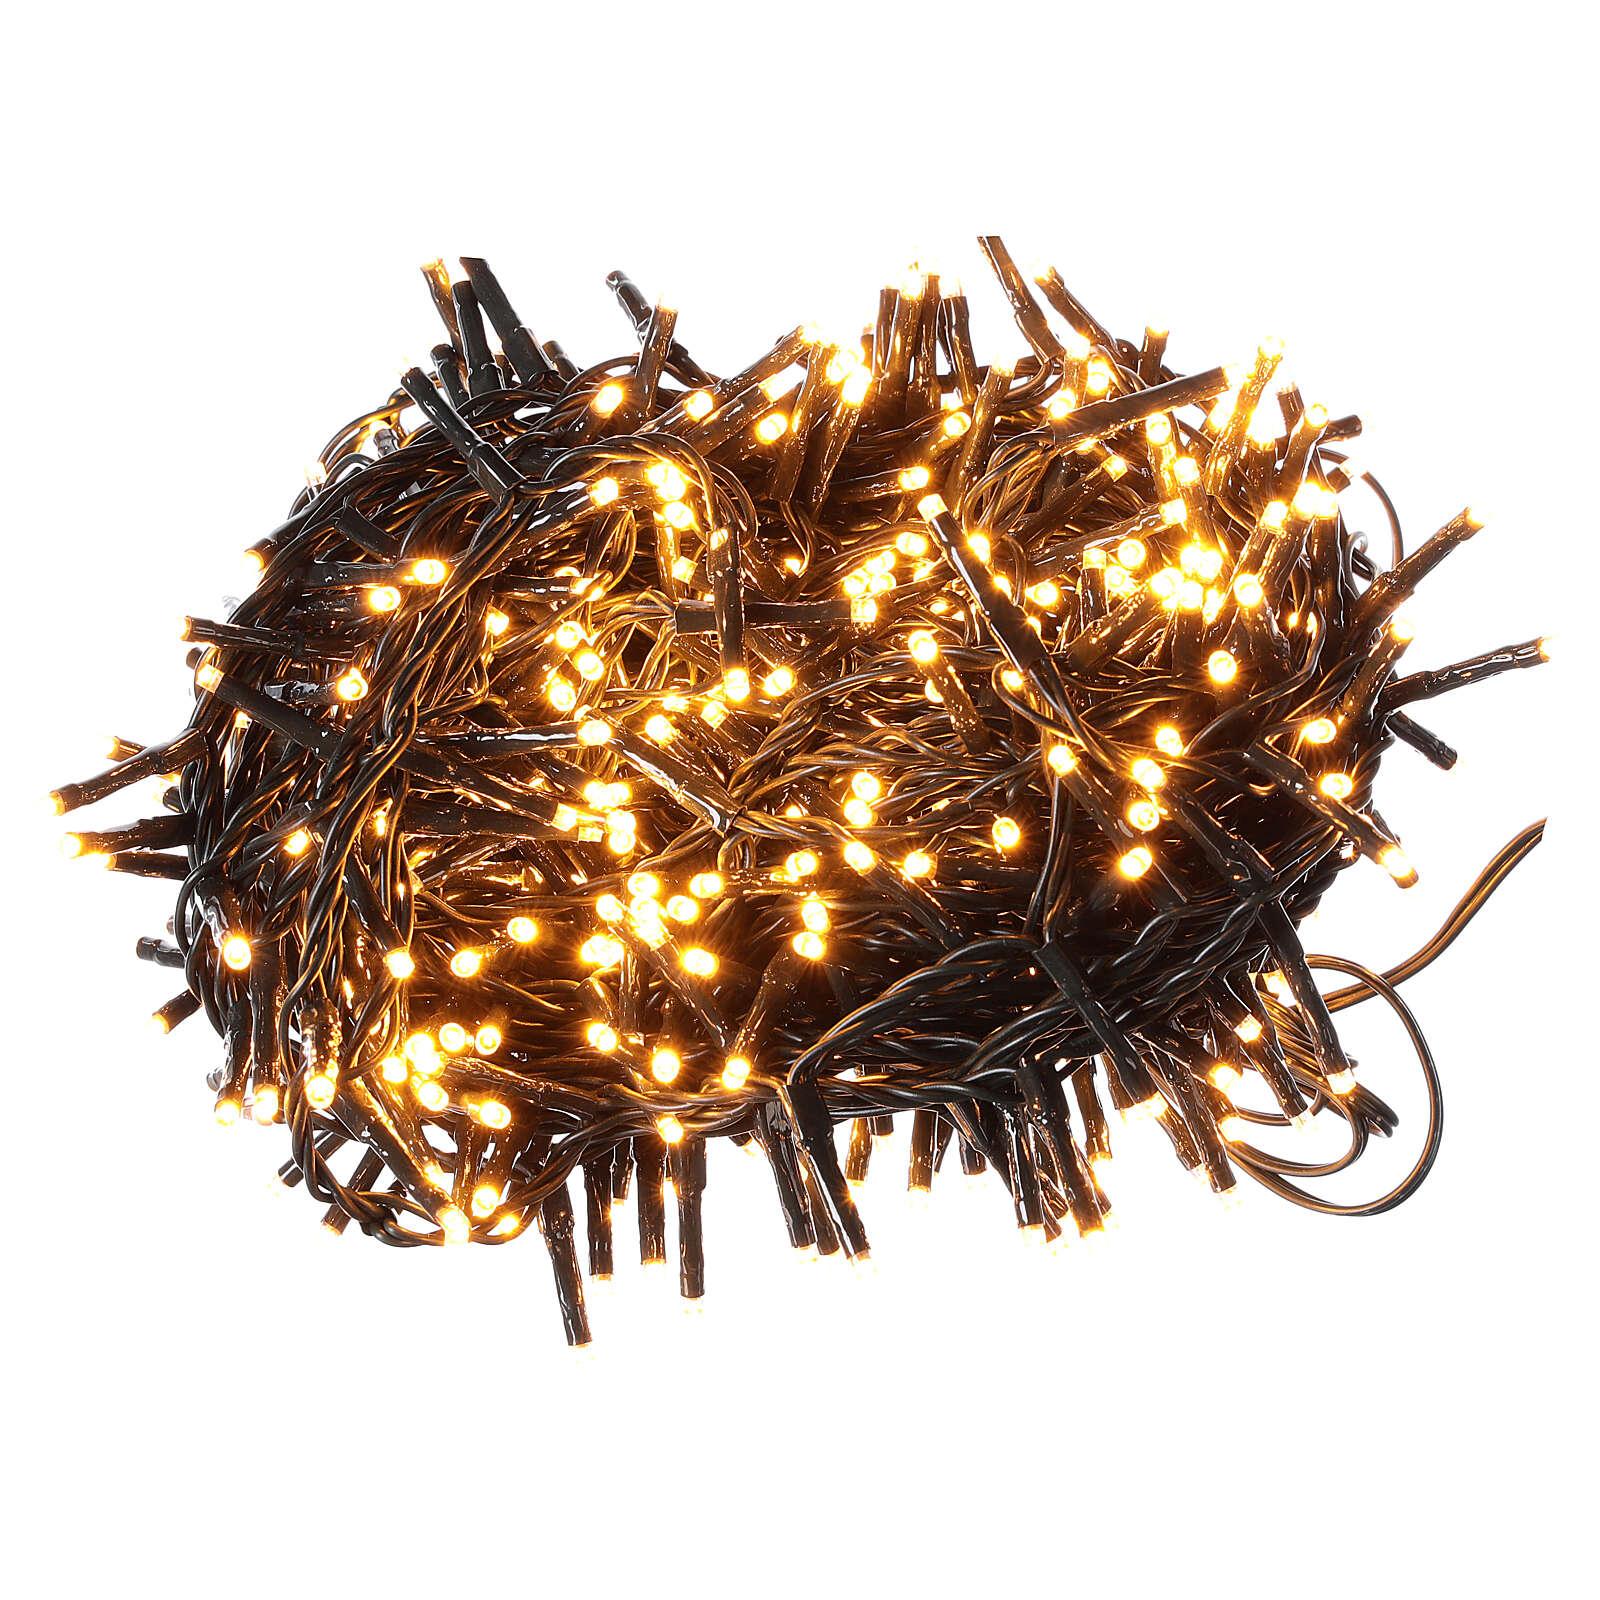 Cadena luminosa 500 led blanco cálido ambarino con juegos de luz programables 3